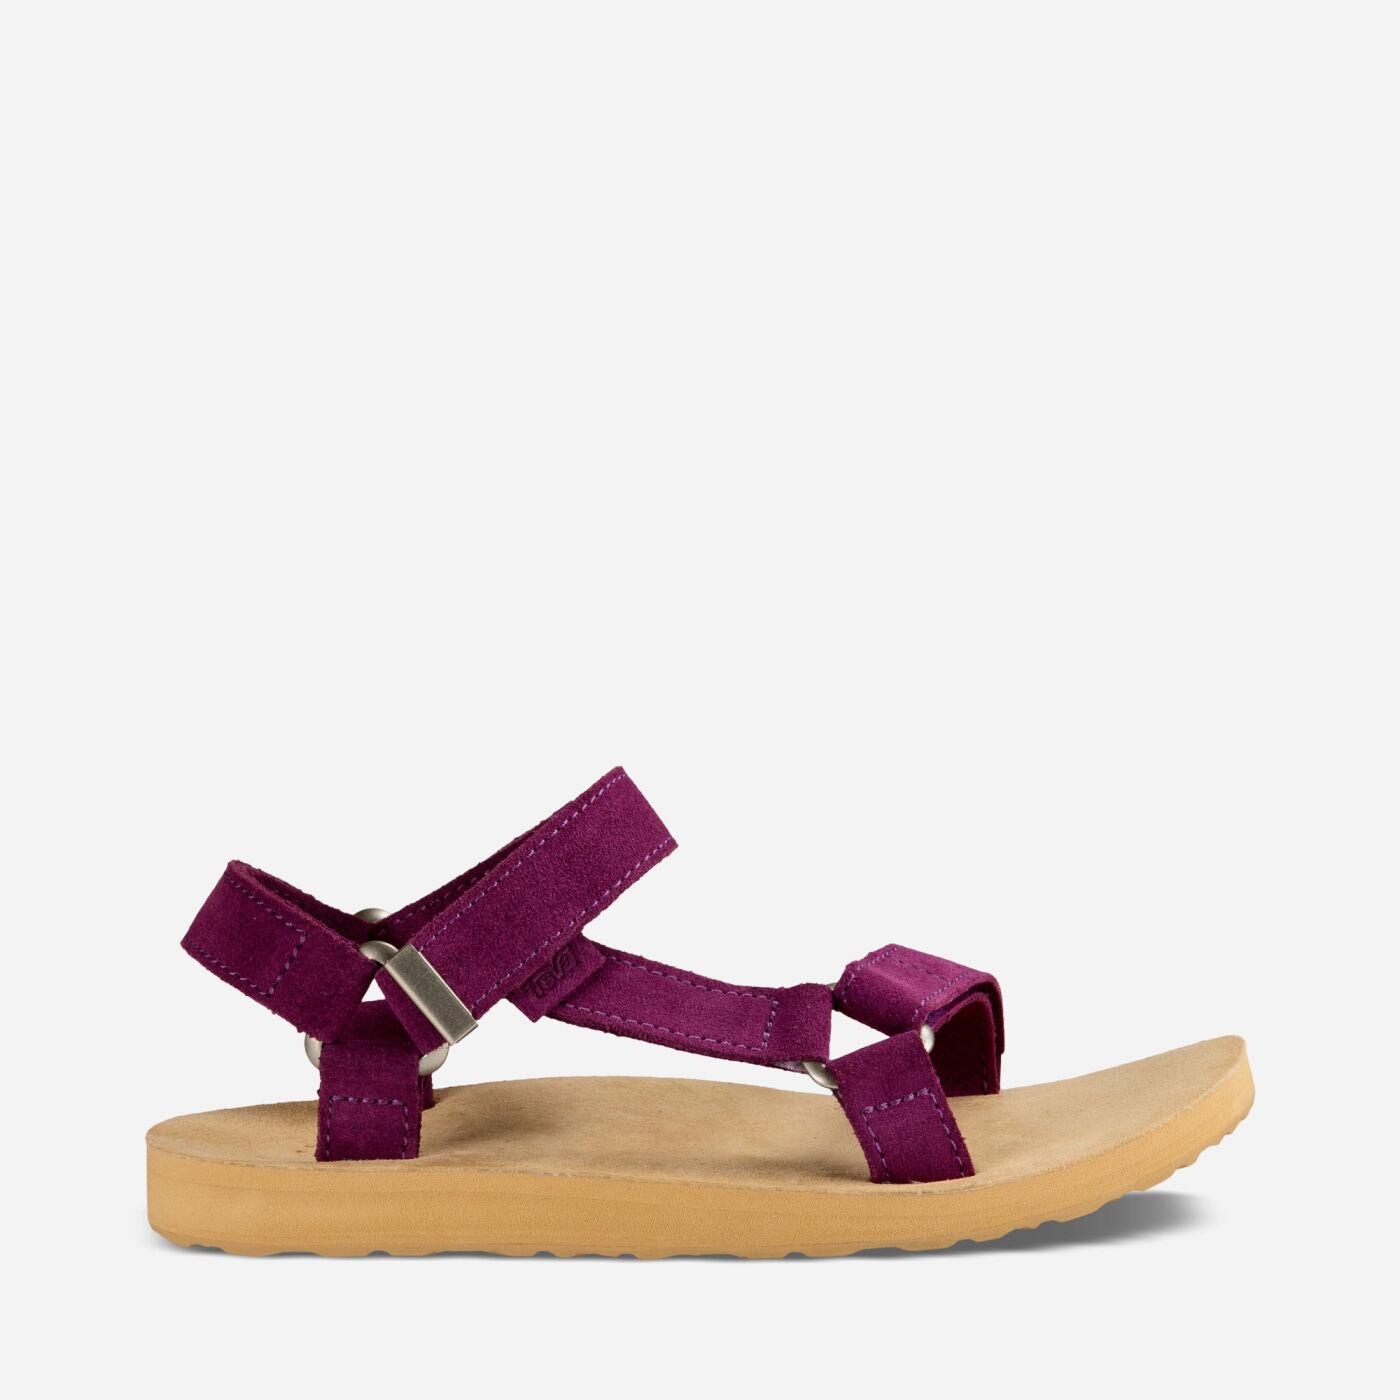 Womens river sandals - Original Universal Suede